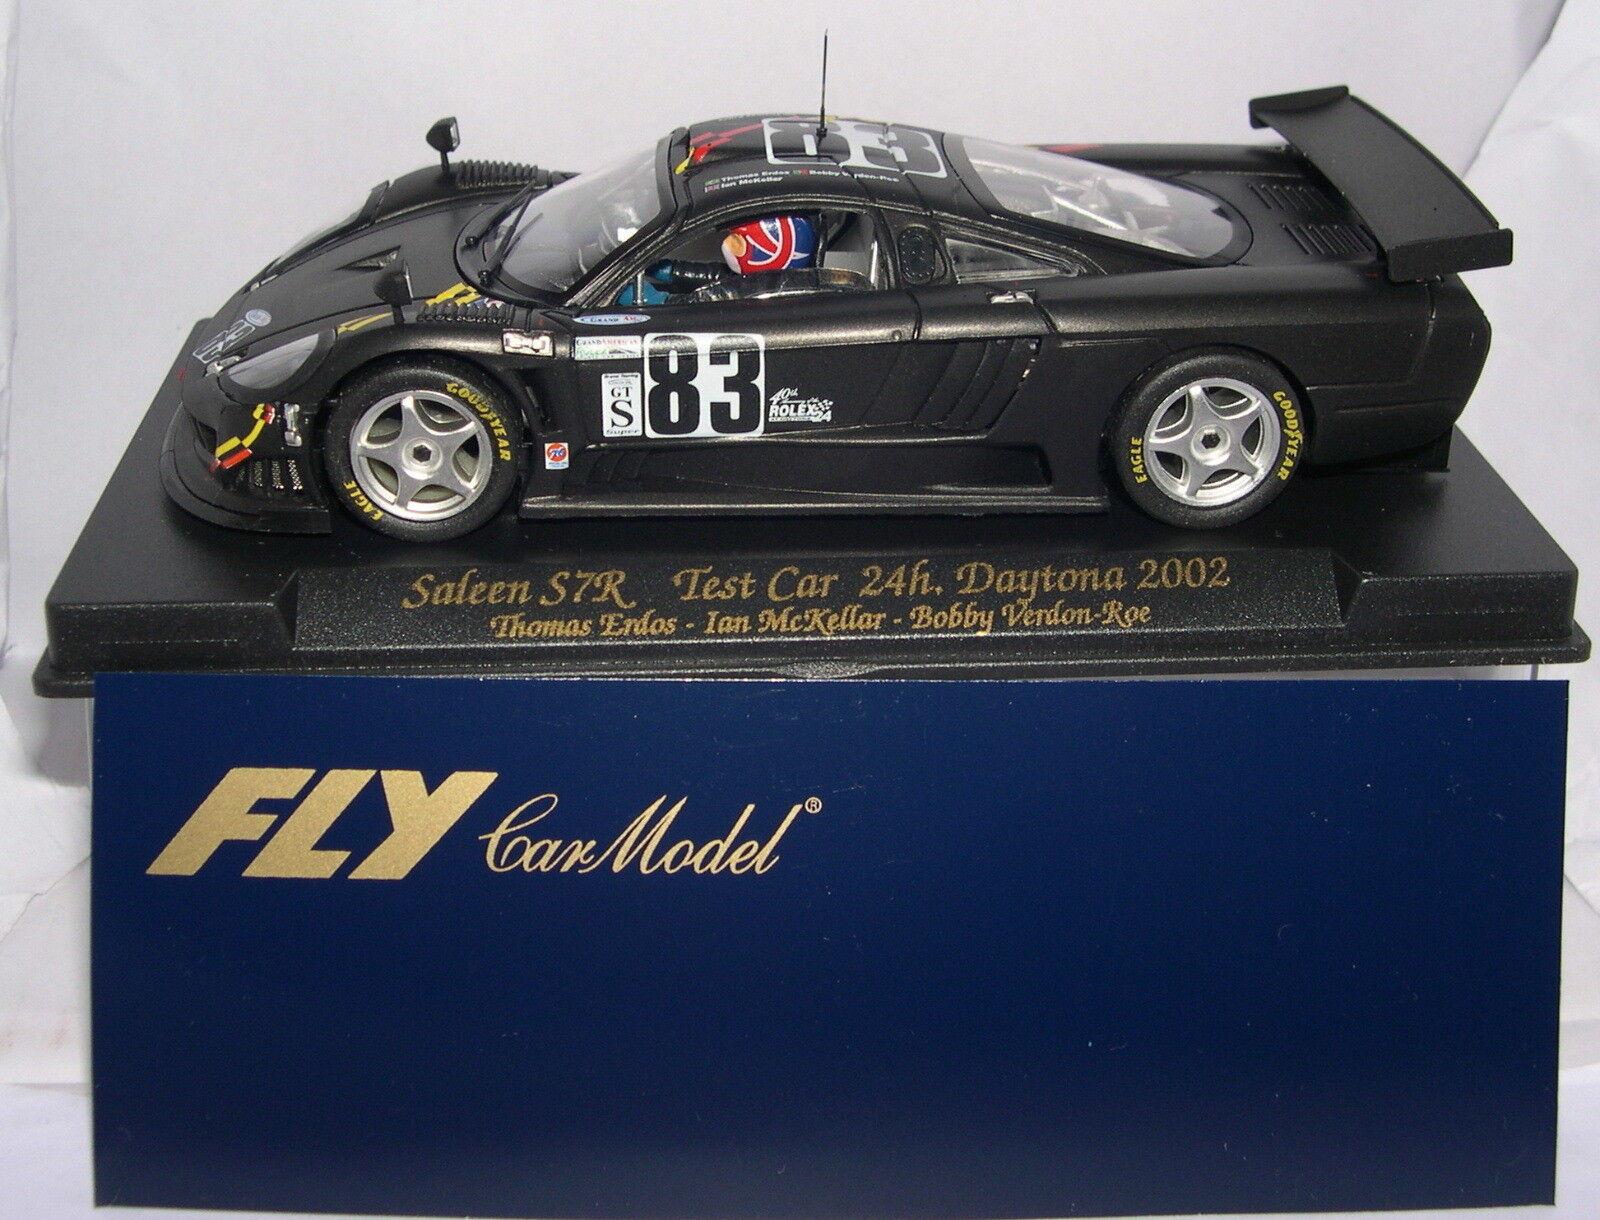 punti vendita Fly 96002 E261SALEEN S7R Test auto auto auto  83 24H Daytona Miniauto 2002 Limit.ed MB  consegna veloce